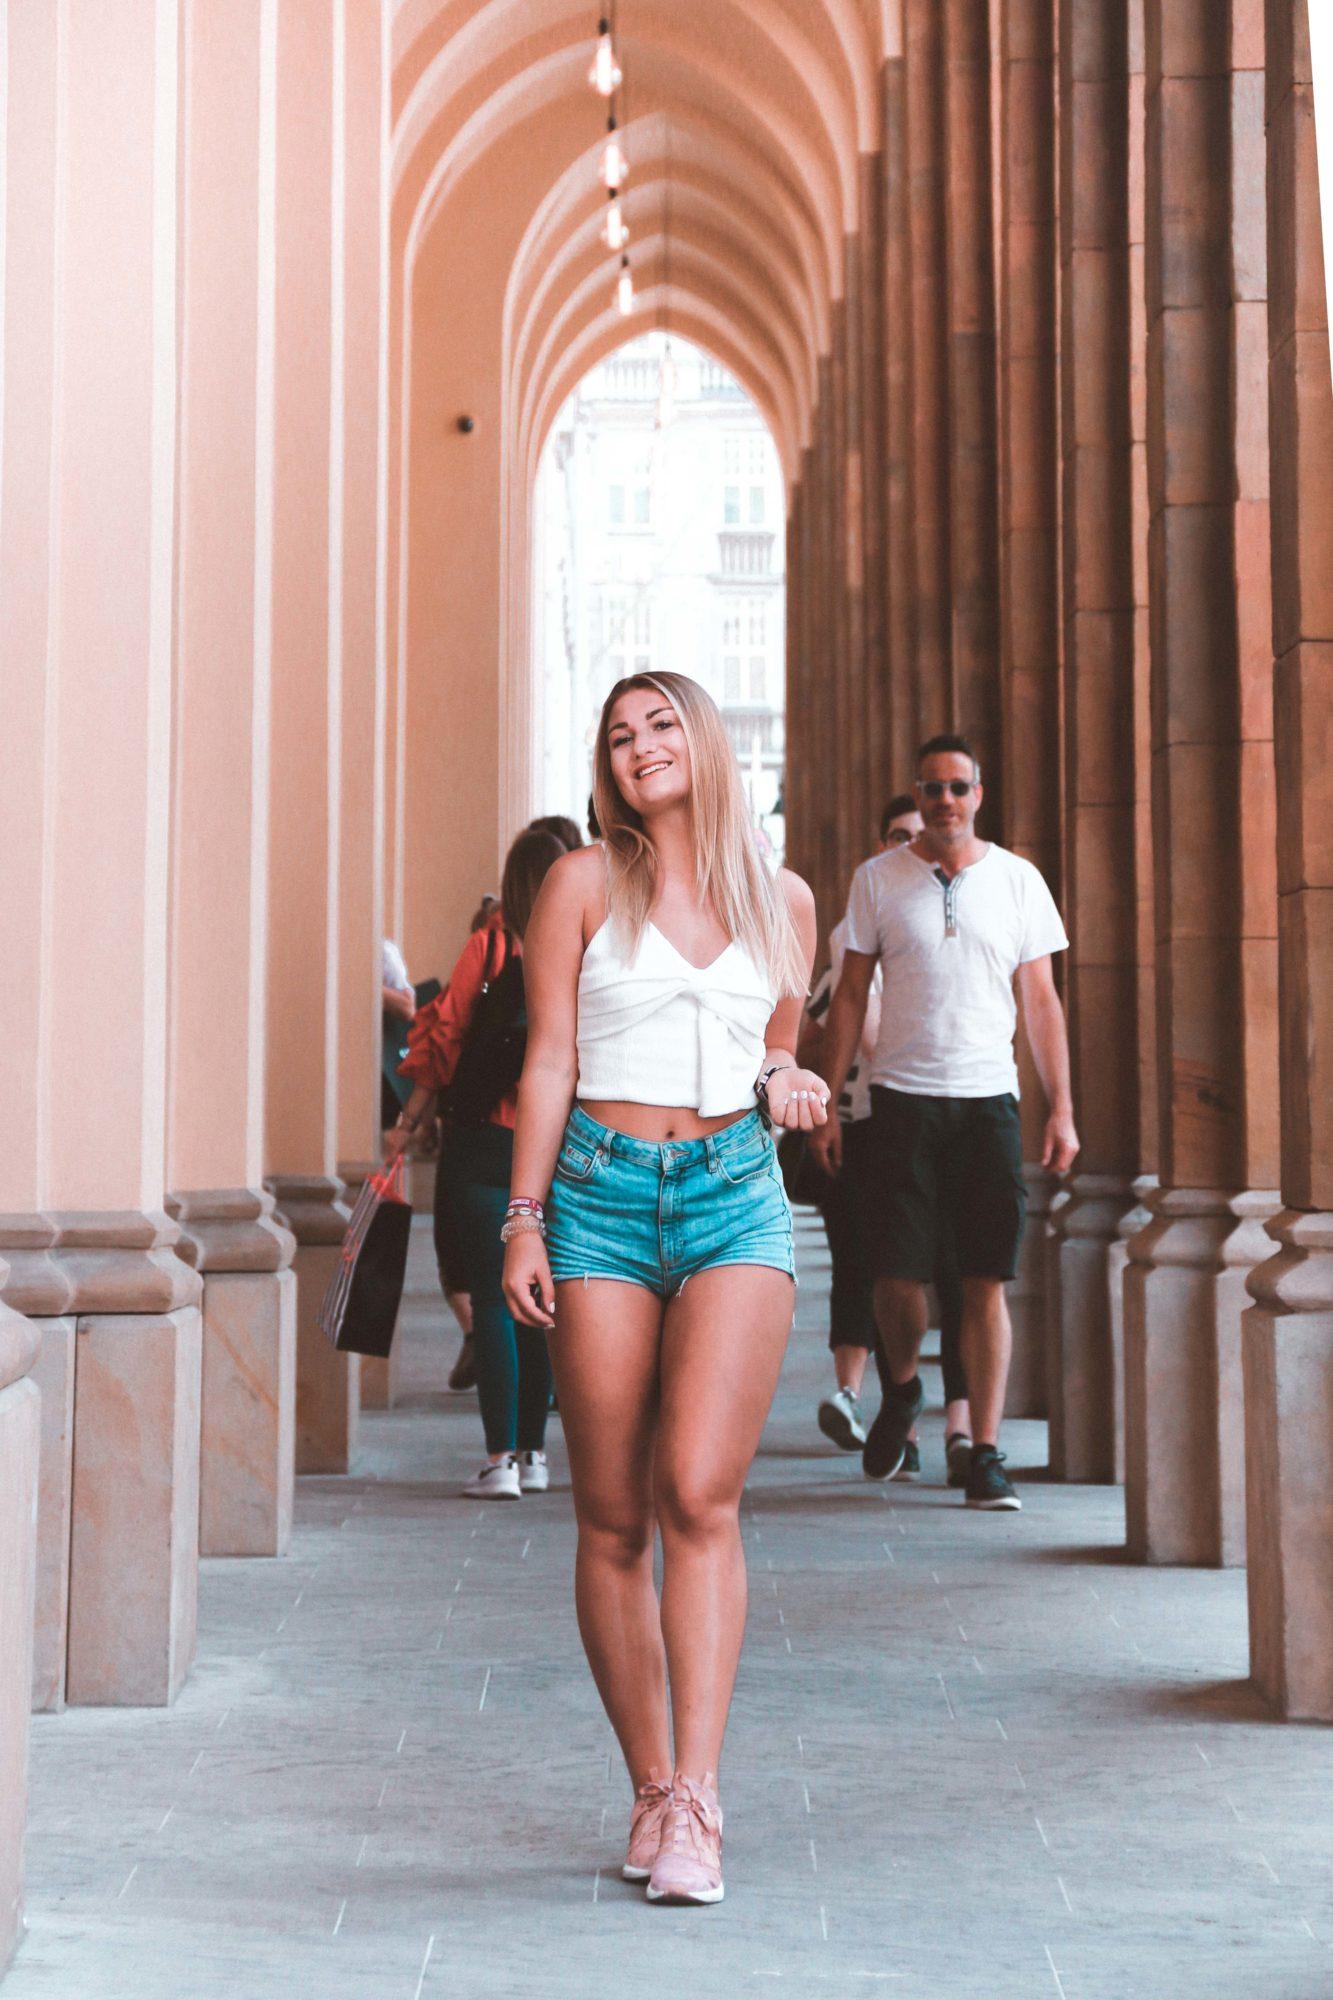 ann-kathrin hitzler fashionweek berlin instagram